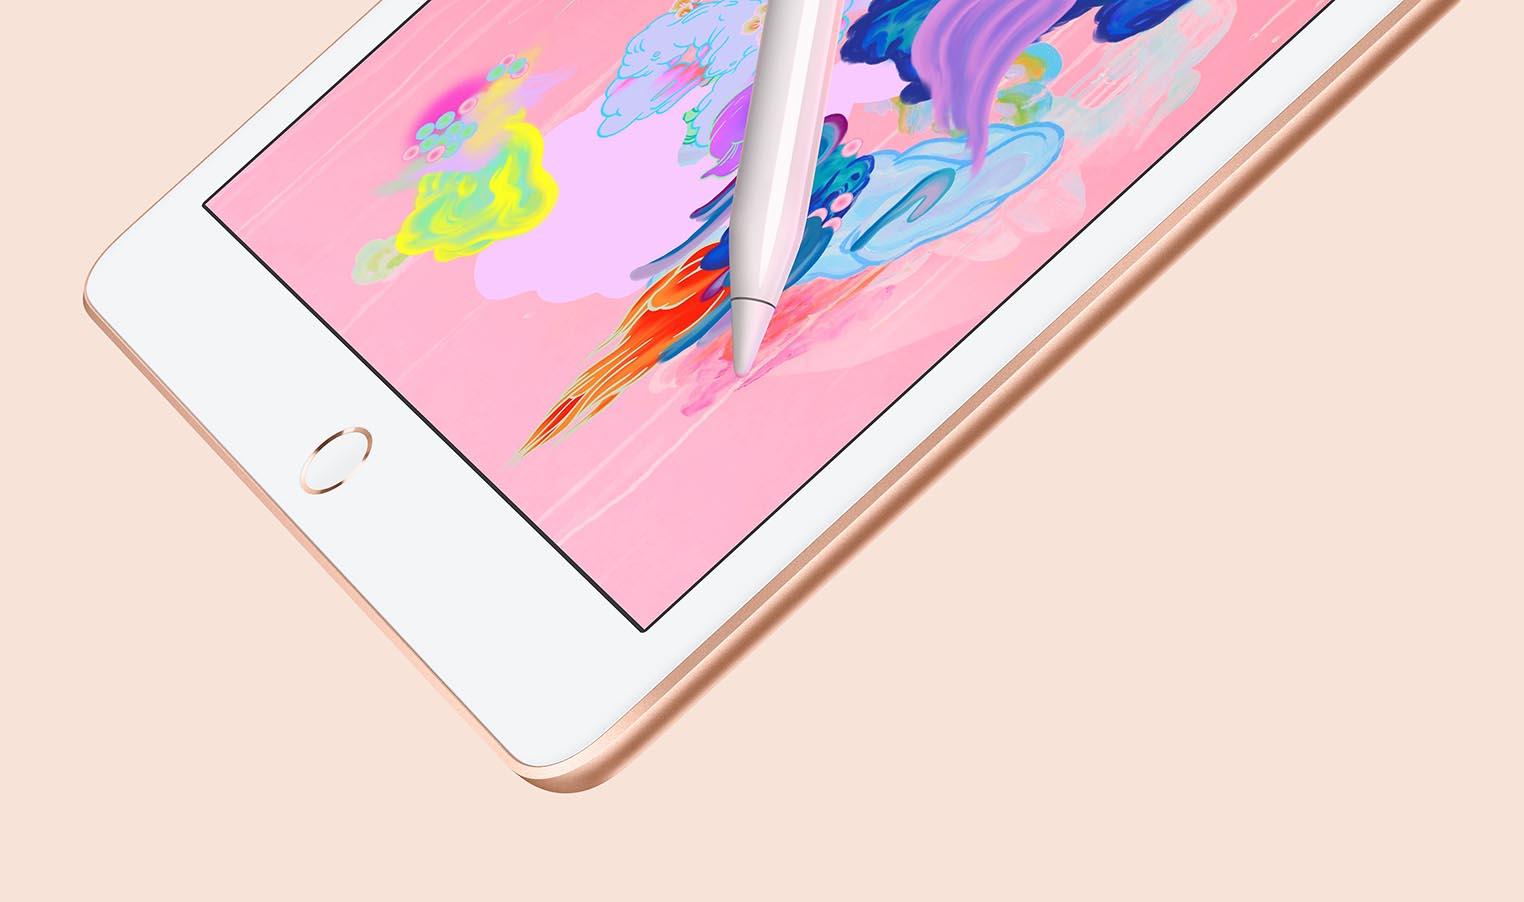 iPad 2018 doré